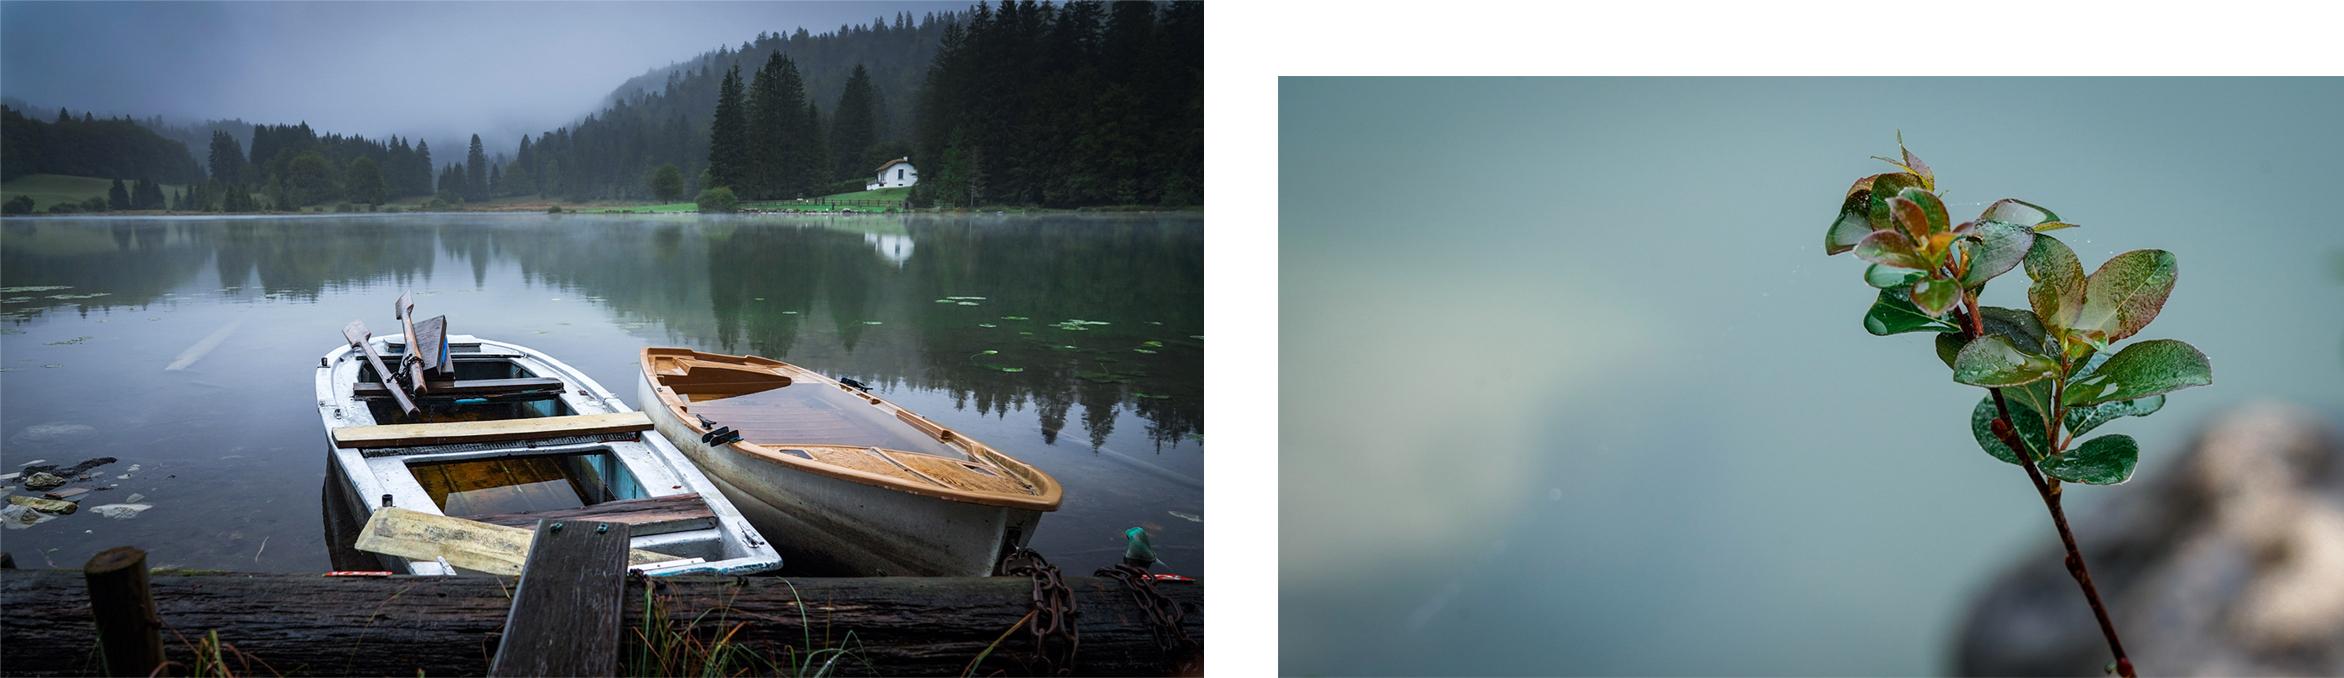 lac Genin plante barques eau nuages sapins